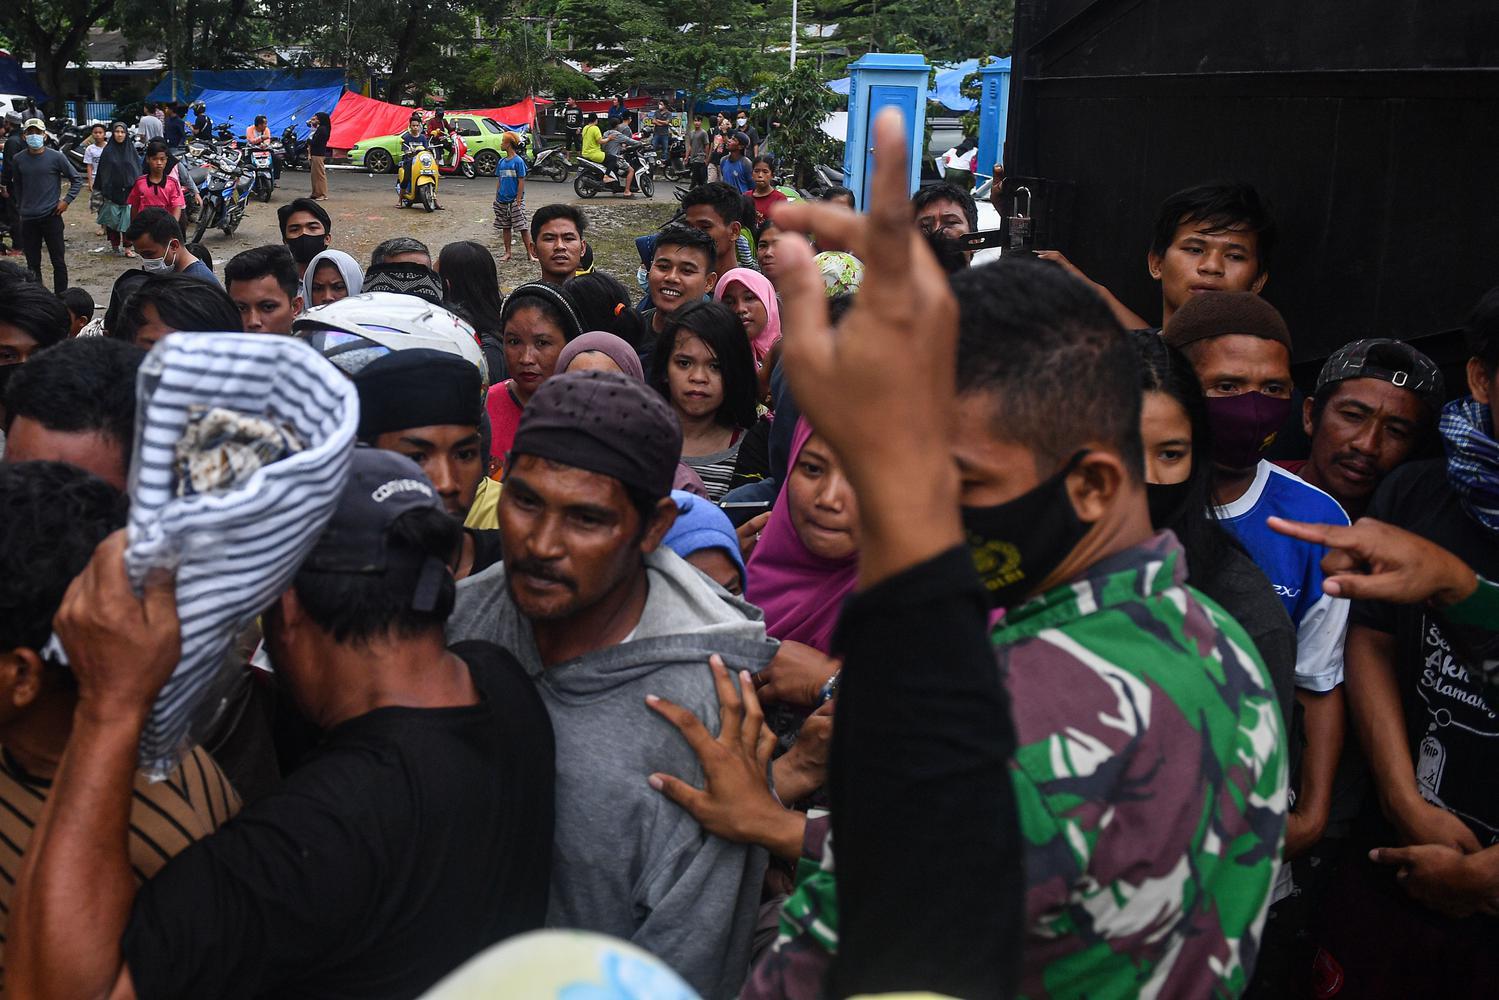 Pengungsi korban gempa antre untuk mendapatkan logistik dari TNI AD di Stadion Manakarra, Mamuju, Sulawesi Barat, Minggu (17/1/2021). Berdasarkan data BNPB per 17 Januari pukul 14.00 WIB, jumlah korban meninggal dunia akibat gempa bumi magnitudo 6,2 di Sulawesi Barat telah mencapai 73 orang.